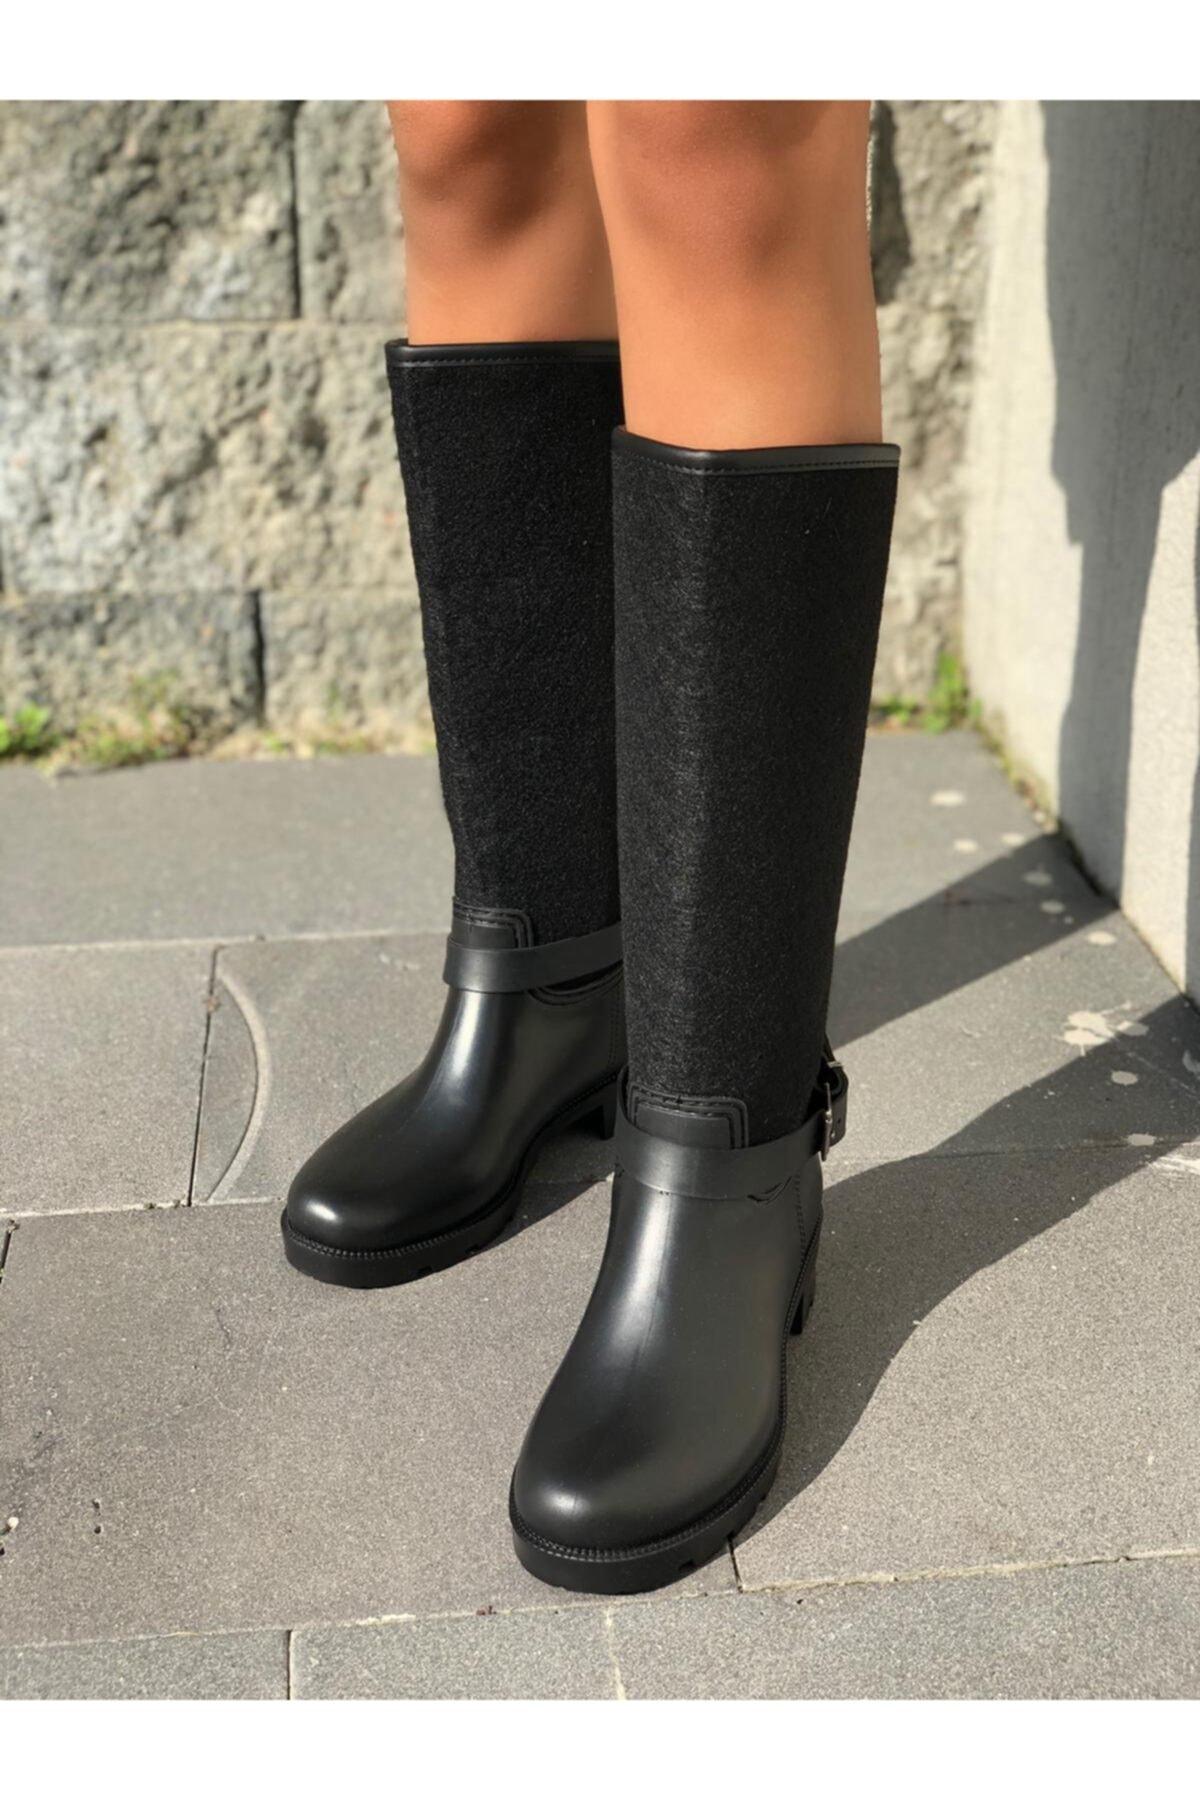 wolk shoes Kadın Siyah Kaşe Yagmur Cizmesi 1